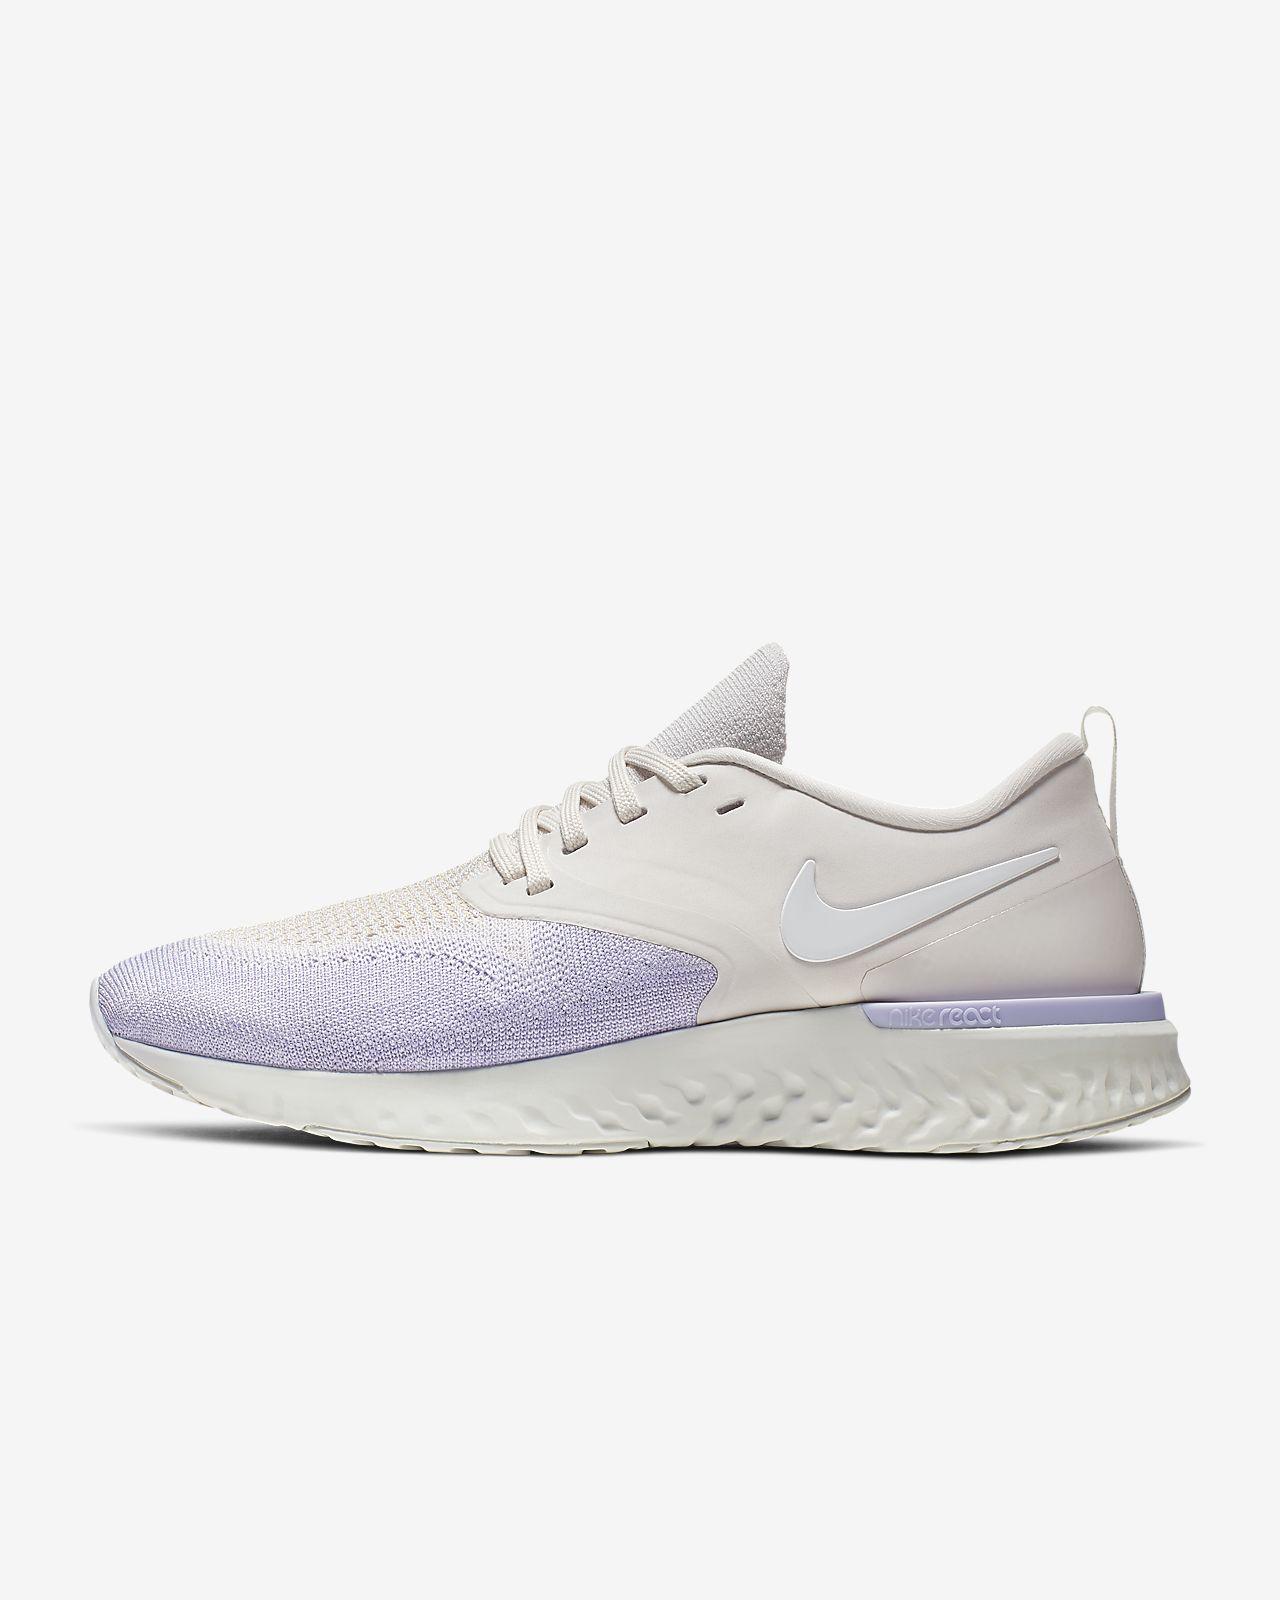 Nike Odyssey React Flyknit 2 Hardloopschoen voor dames